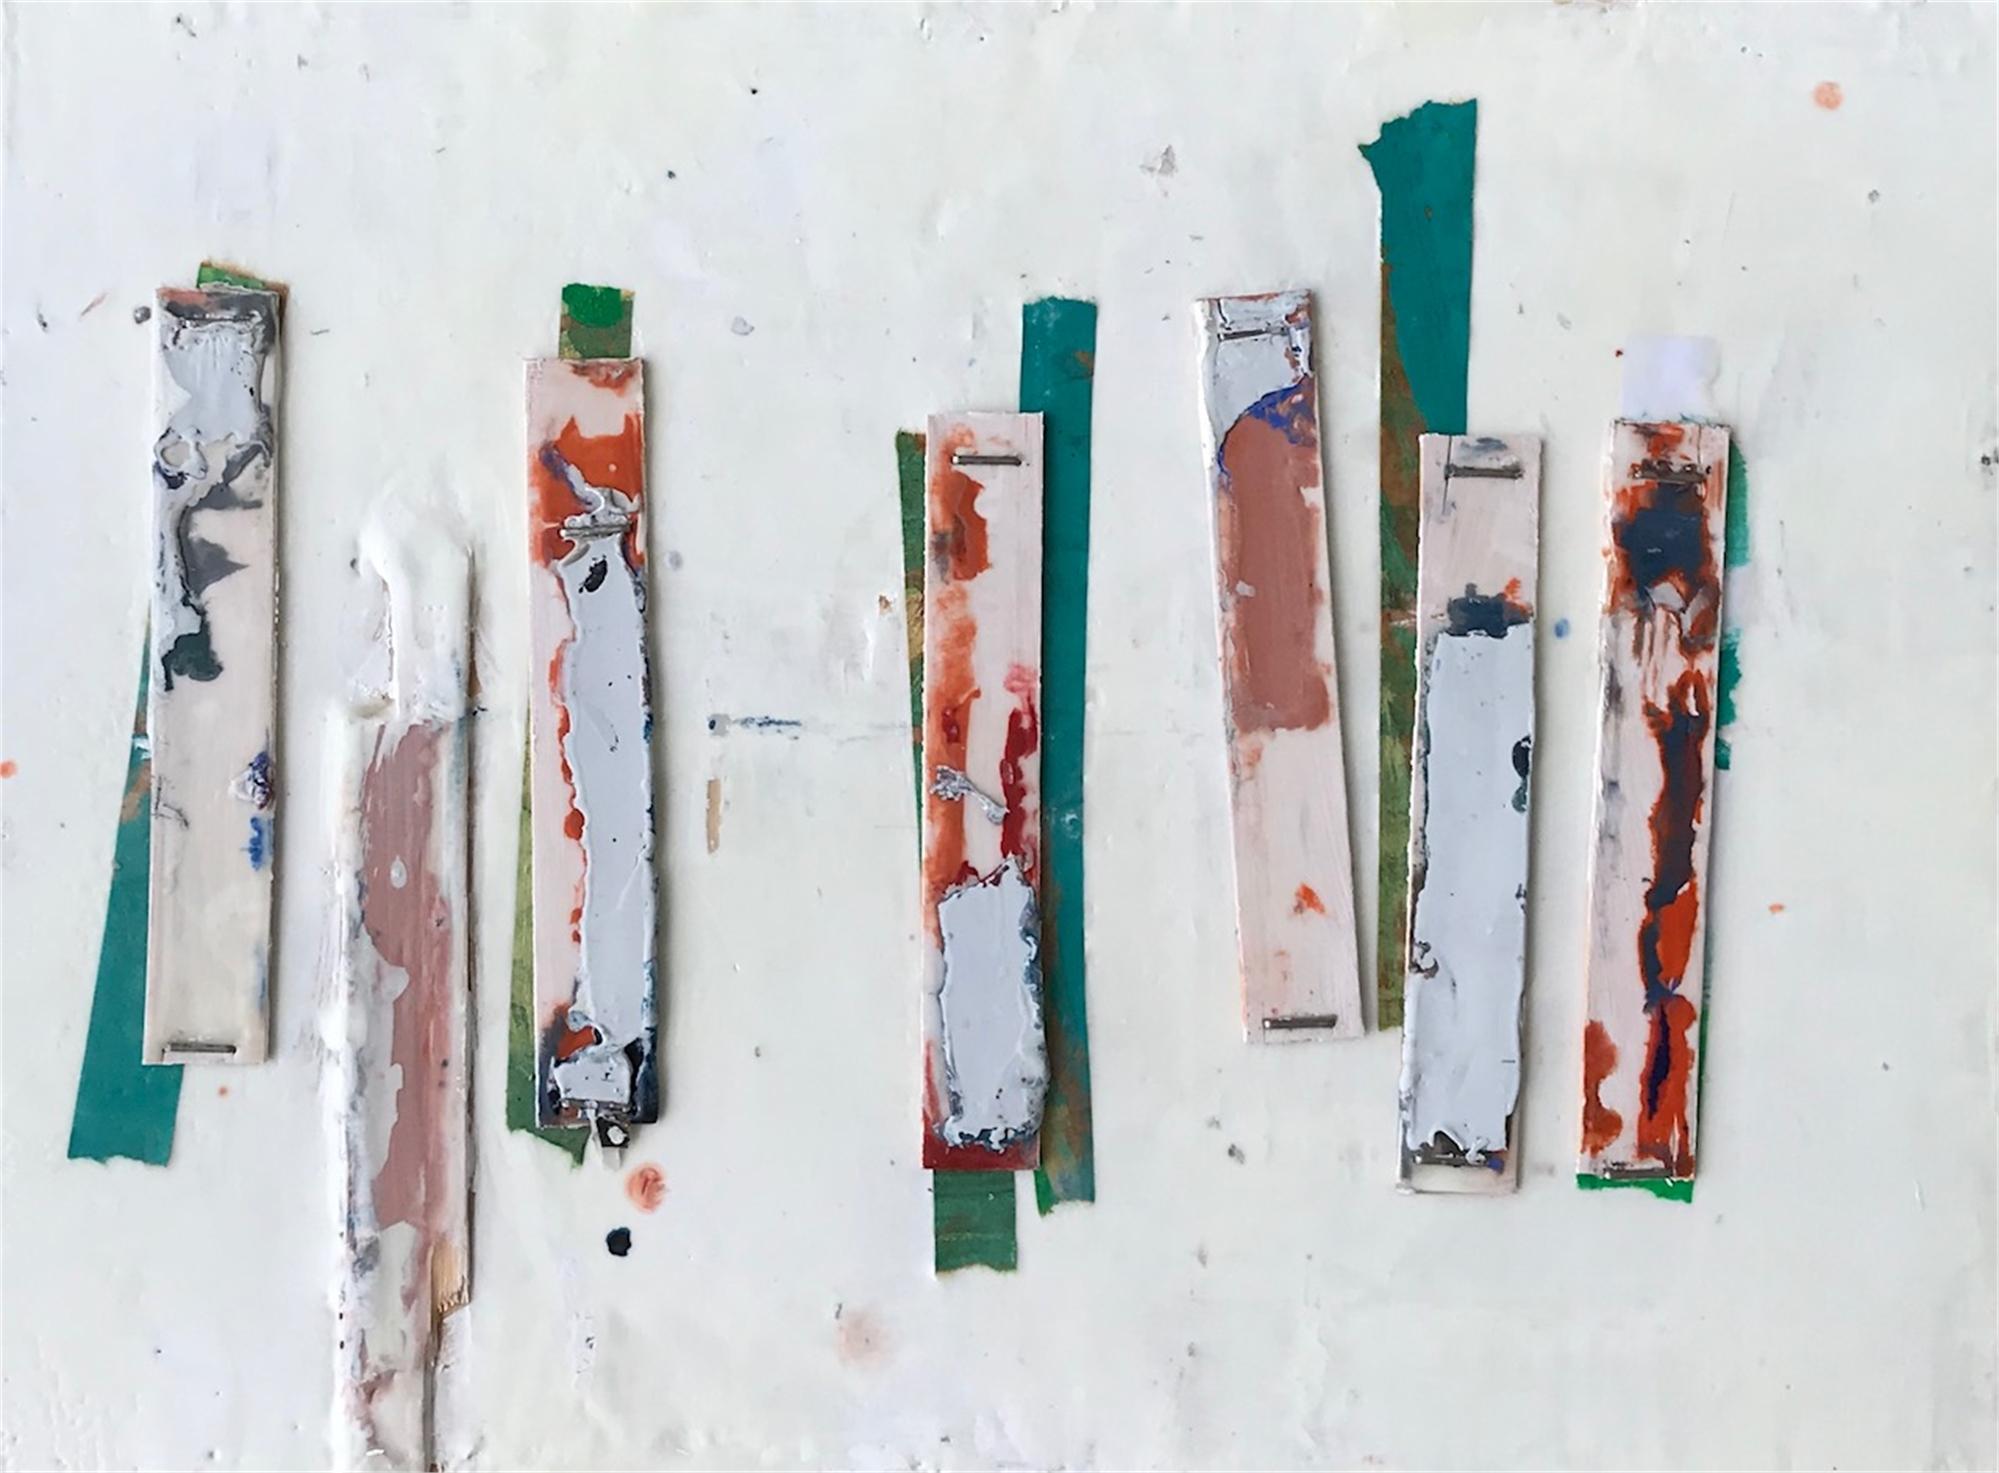 On a Whim III by Marissa Voytenko